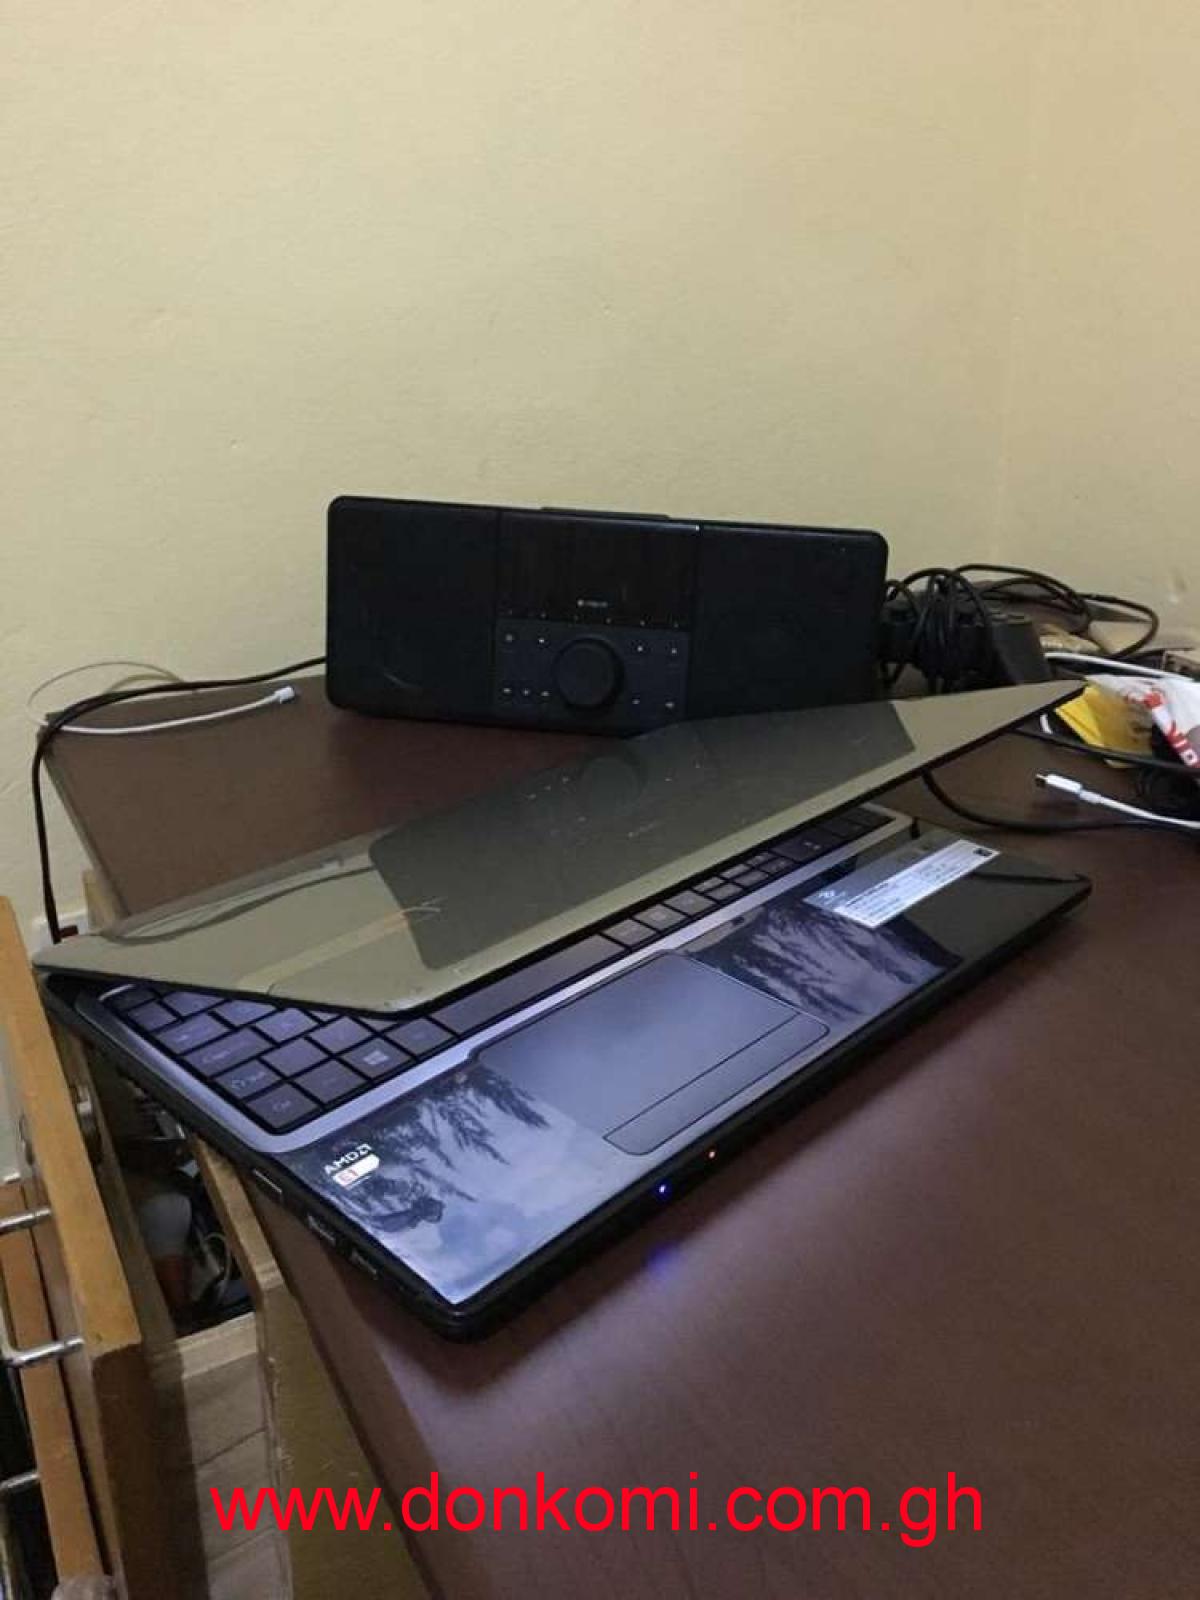 Neat Sleek laptop for sale